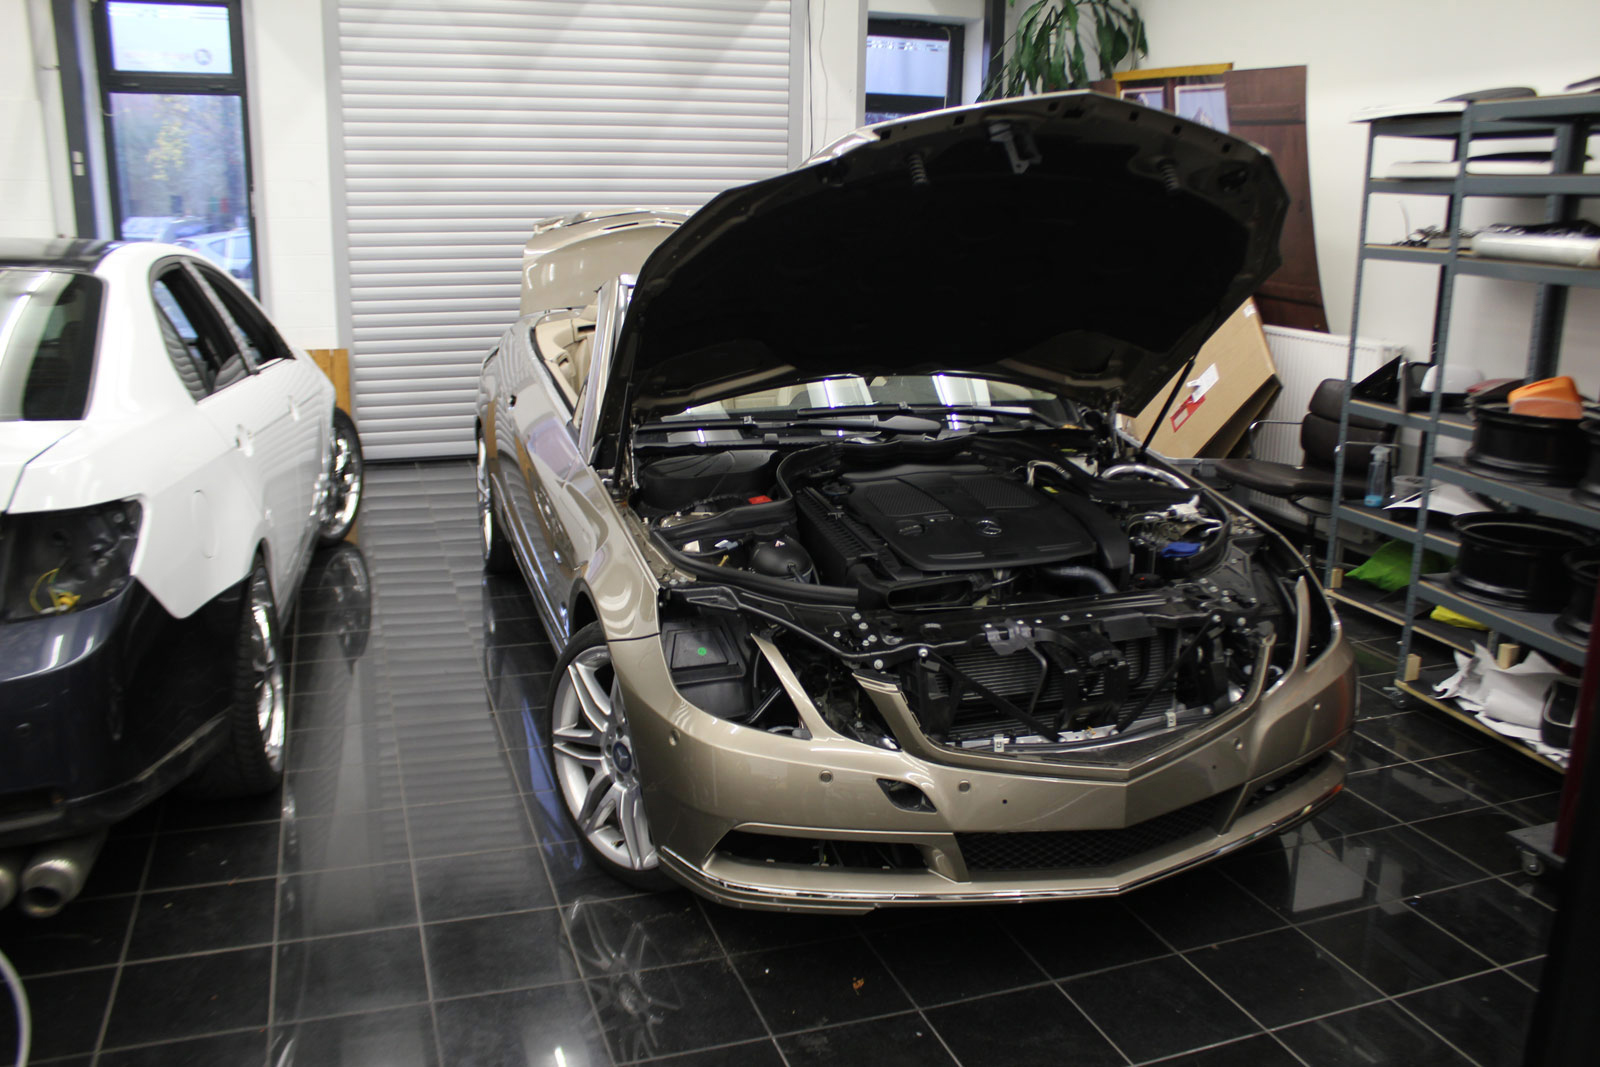 Mercedes_E-Klasse_Cabrio_Folierung_Stannitgrau_Metallic_Glanz_01